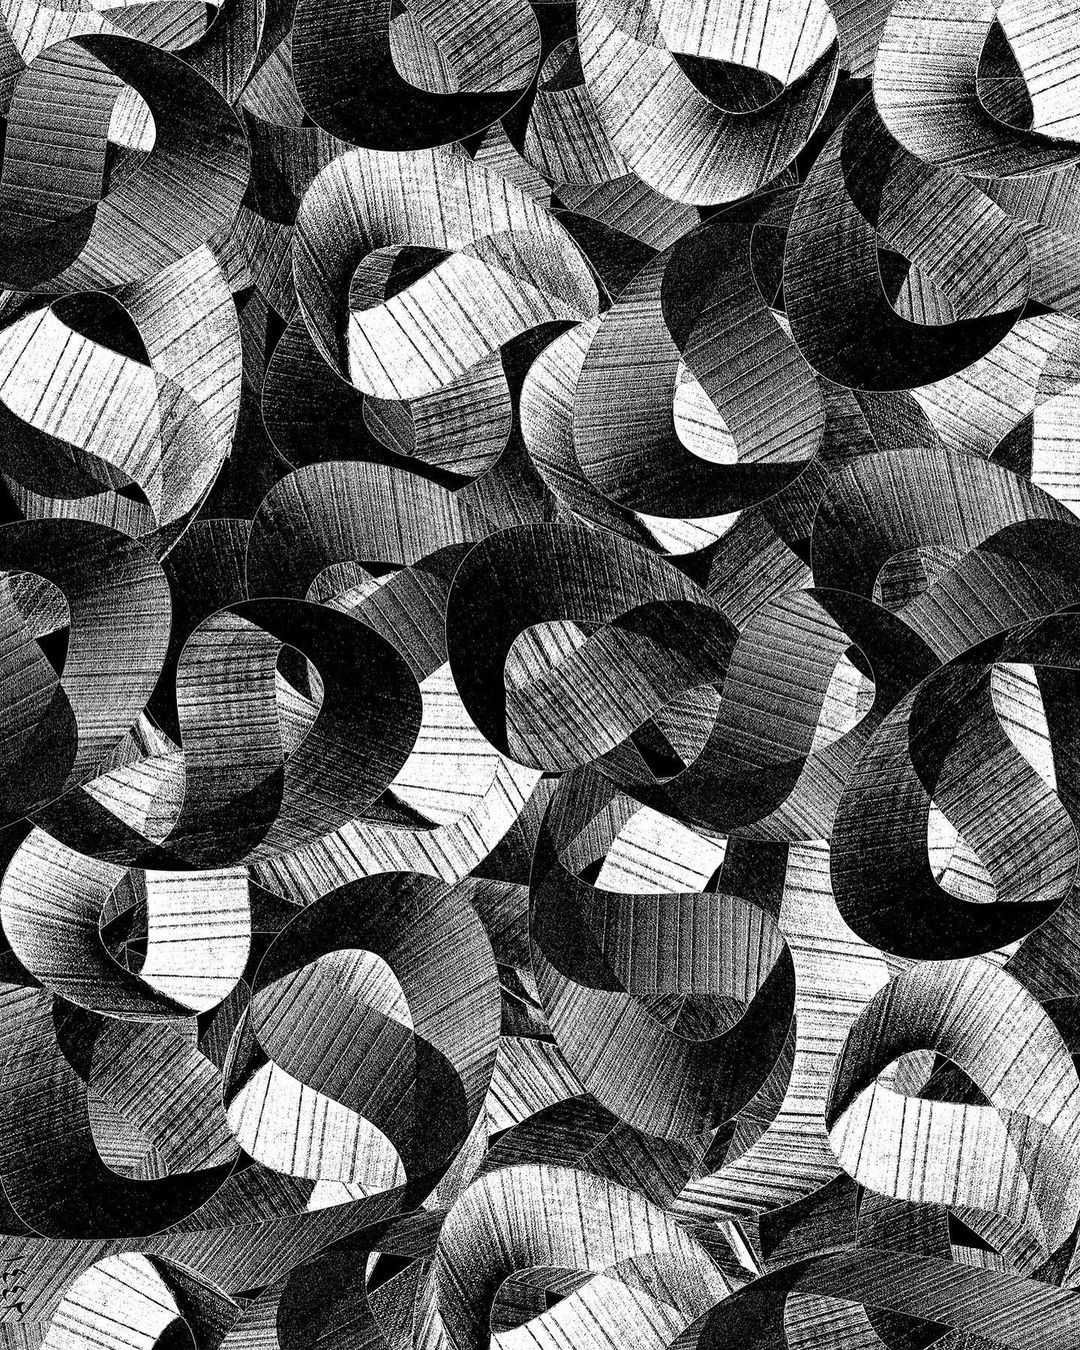 Donwload Photo Kaligrafi Karalama #hat #hattat #hatsanatı #sanat #art #calligraphy #tasarım #islamicart #…- Osman Ozcay